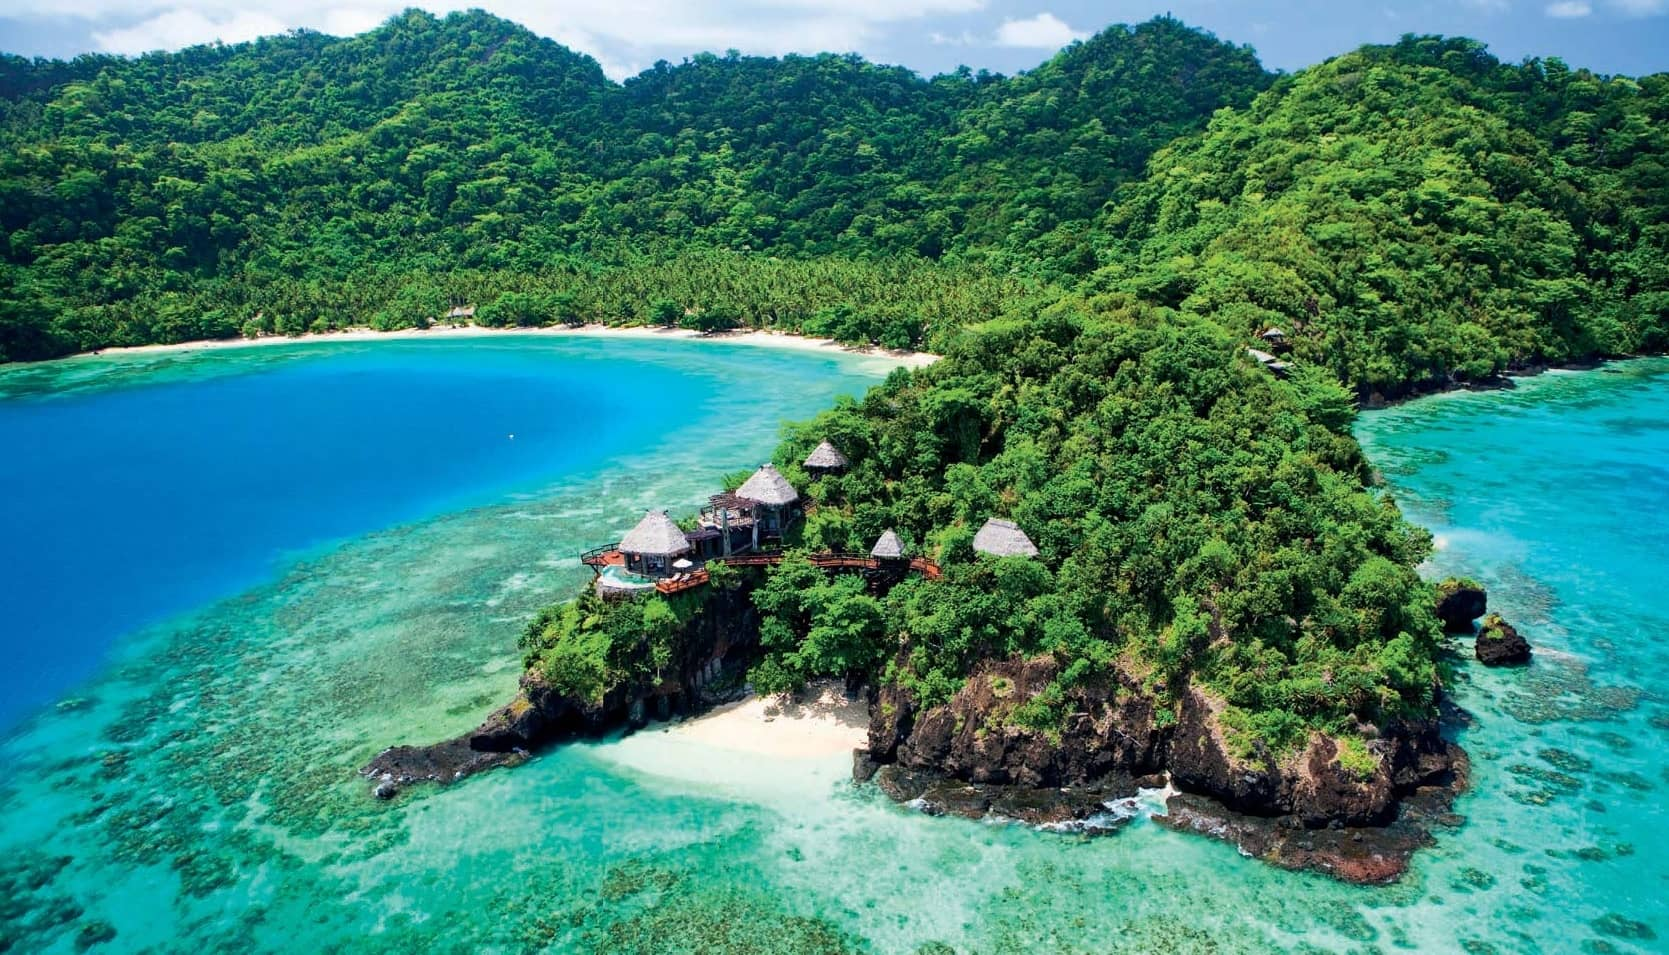 Dreamy Tropical Island … For 2021